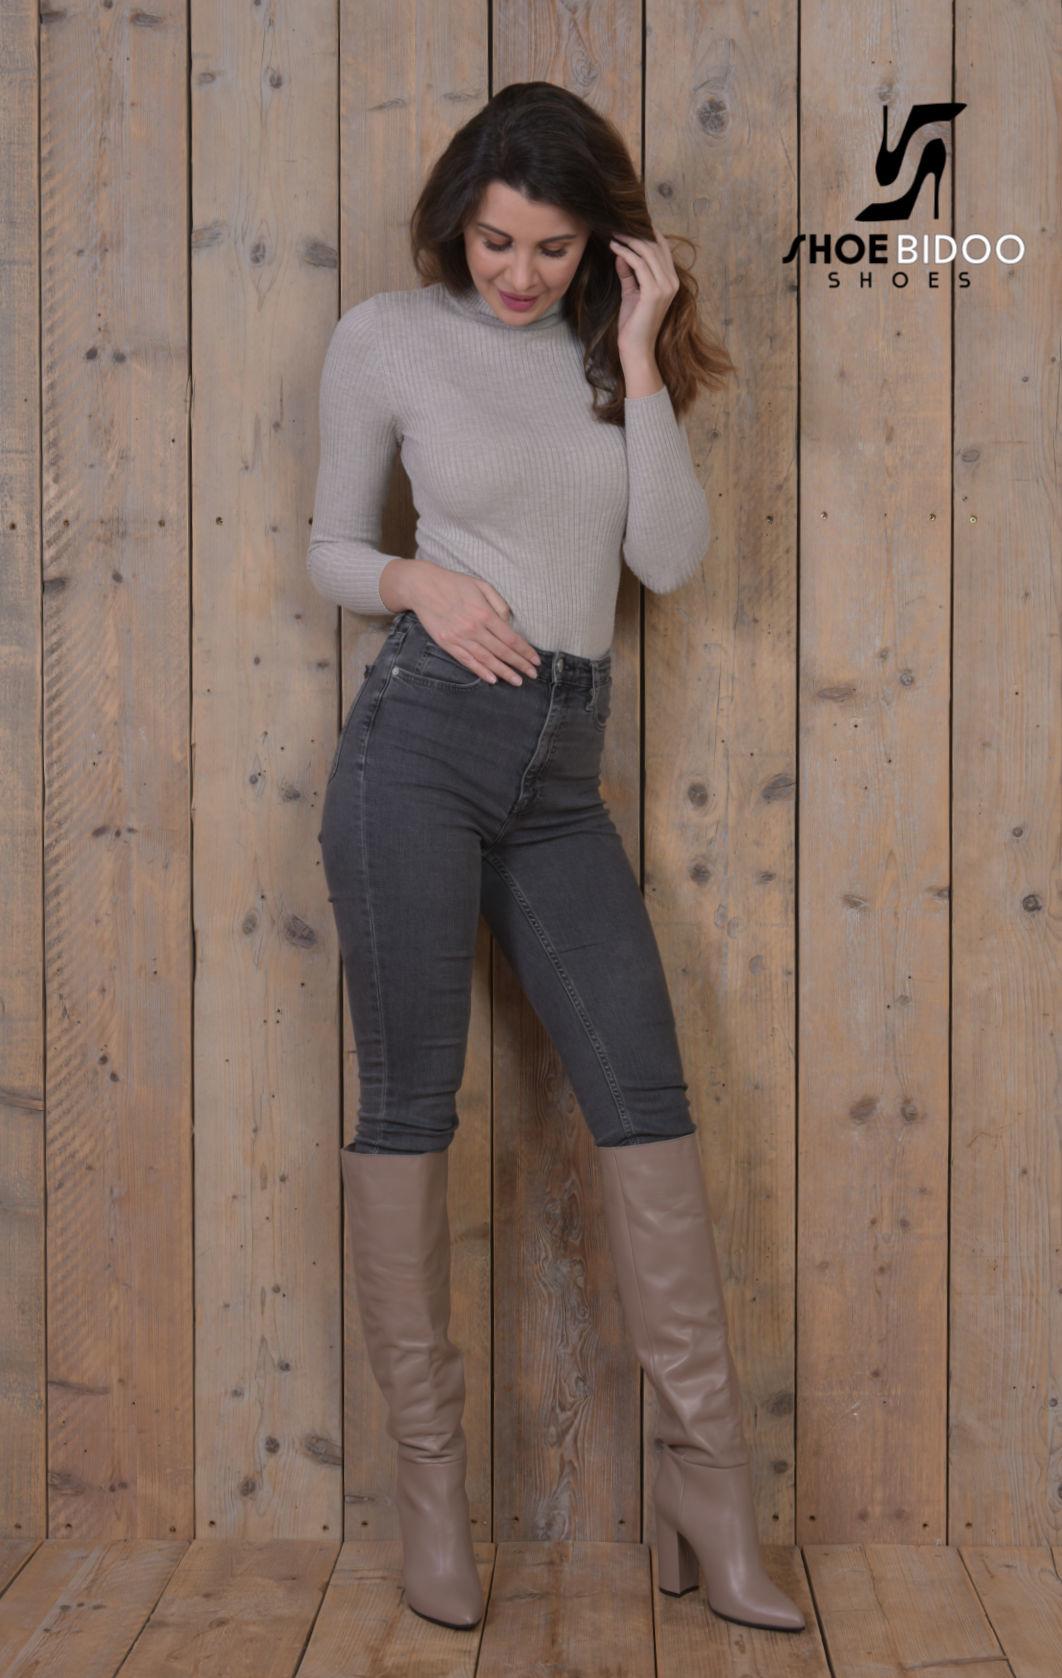 Olga in Italian leather knee boots